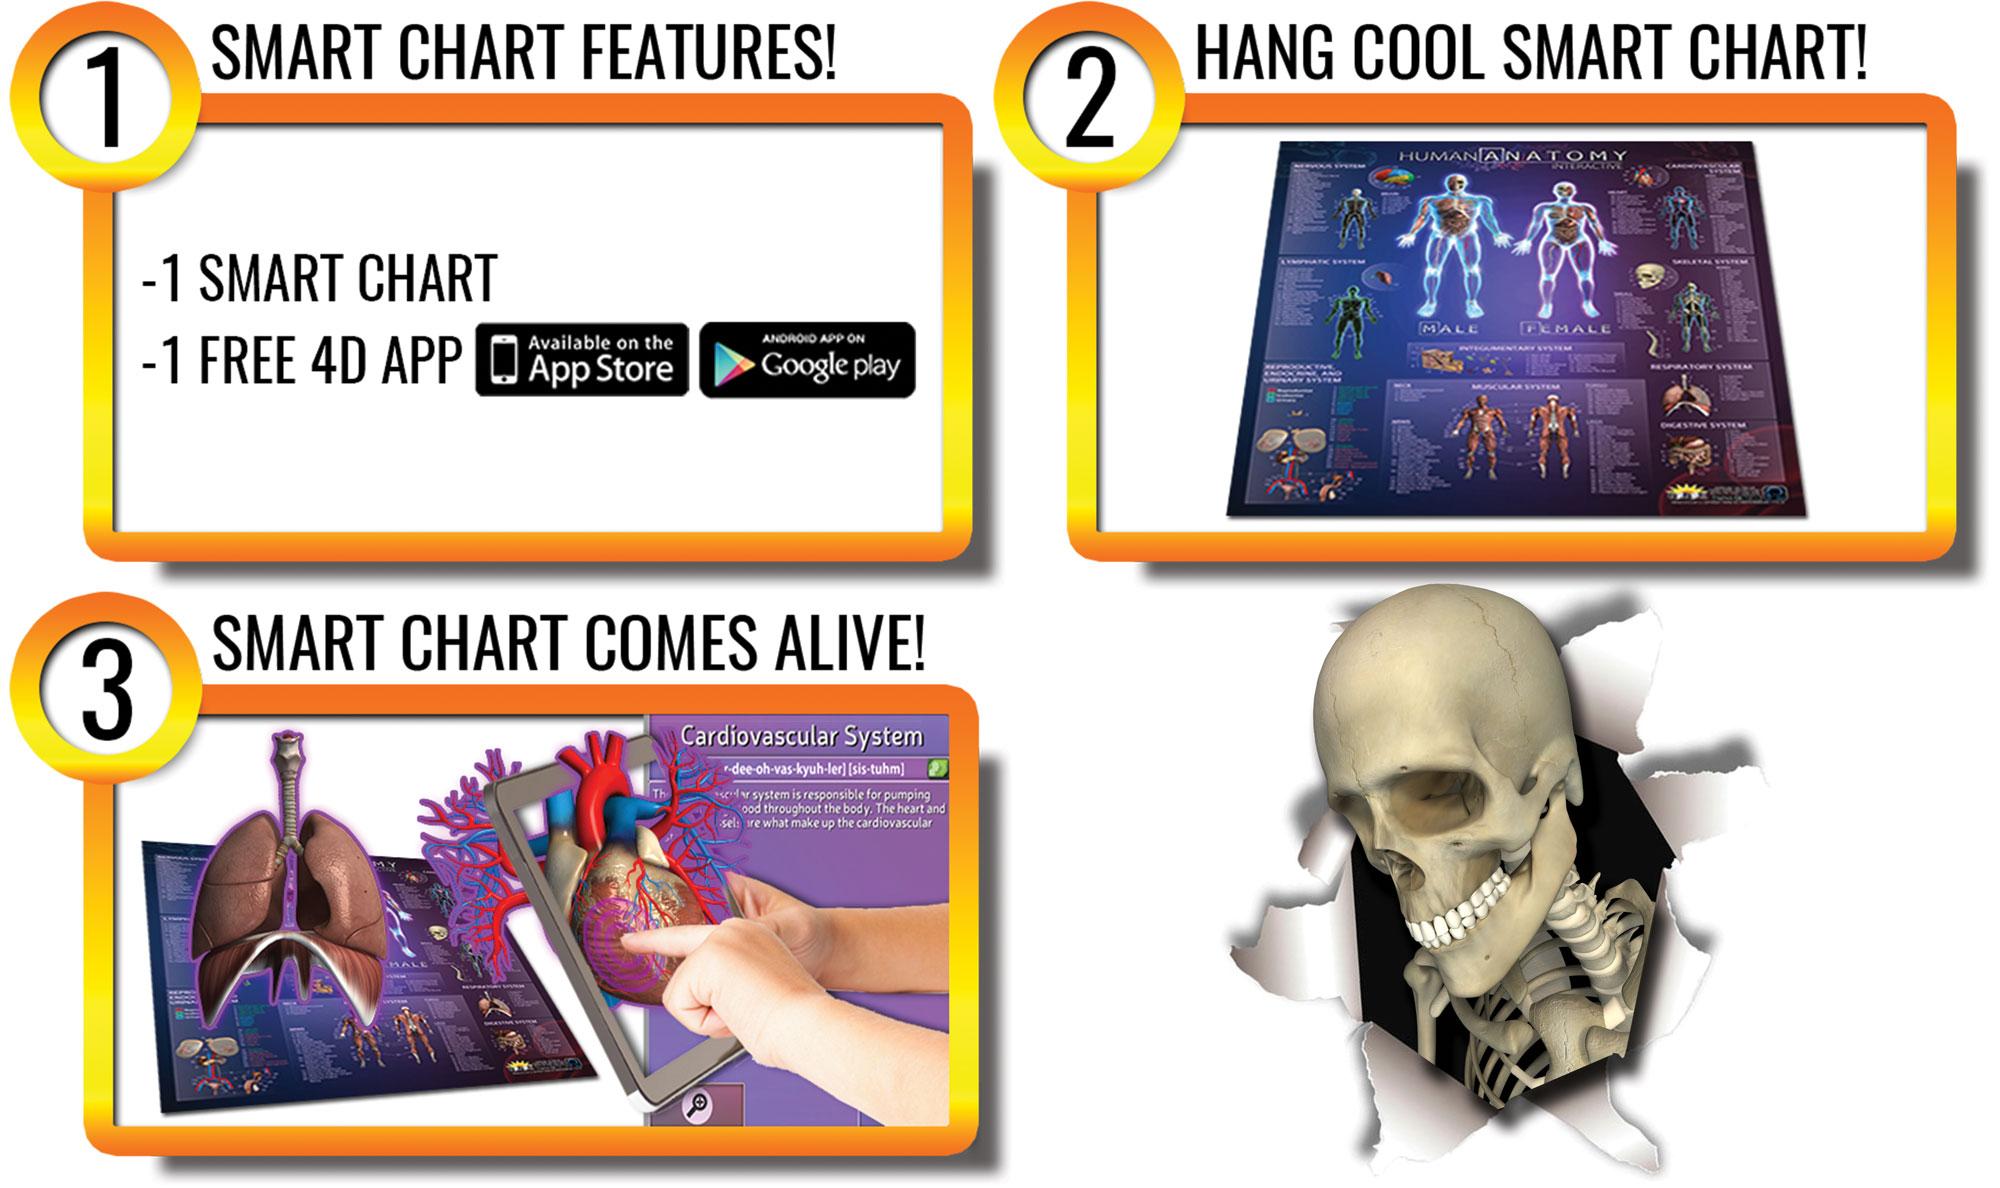 Human Anatomy Augmented Reality Smart Chart